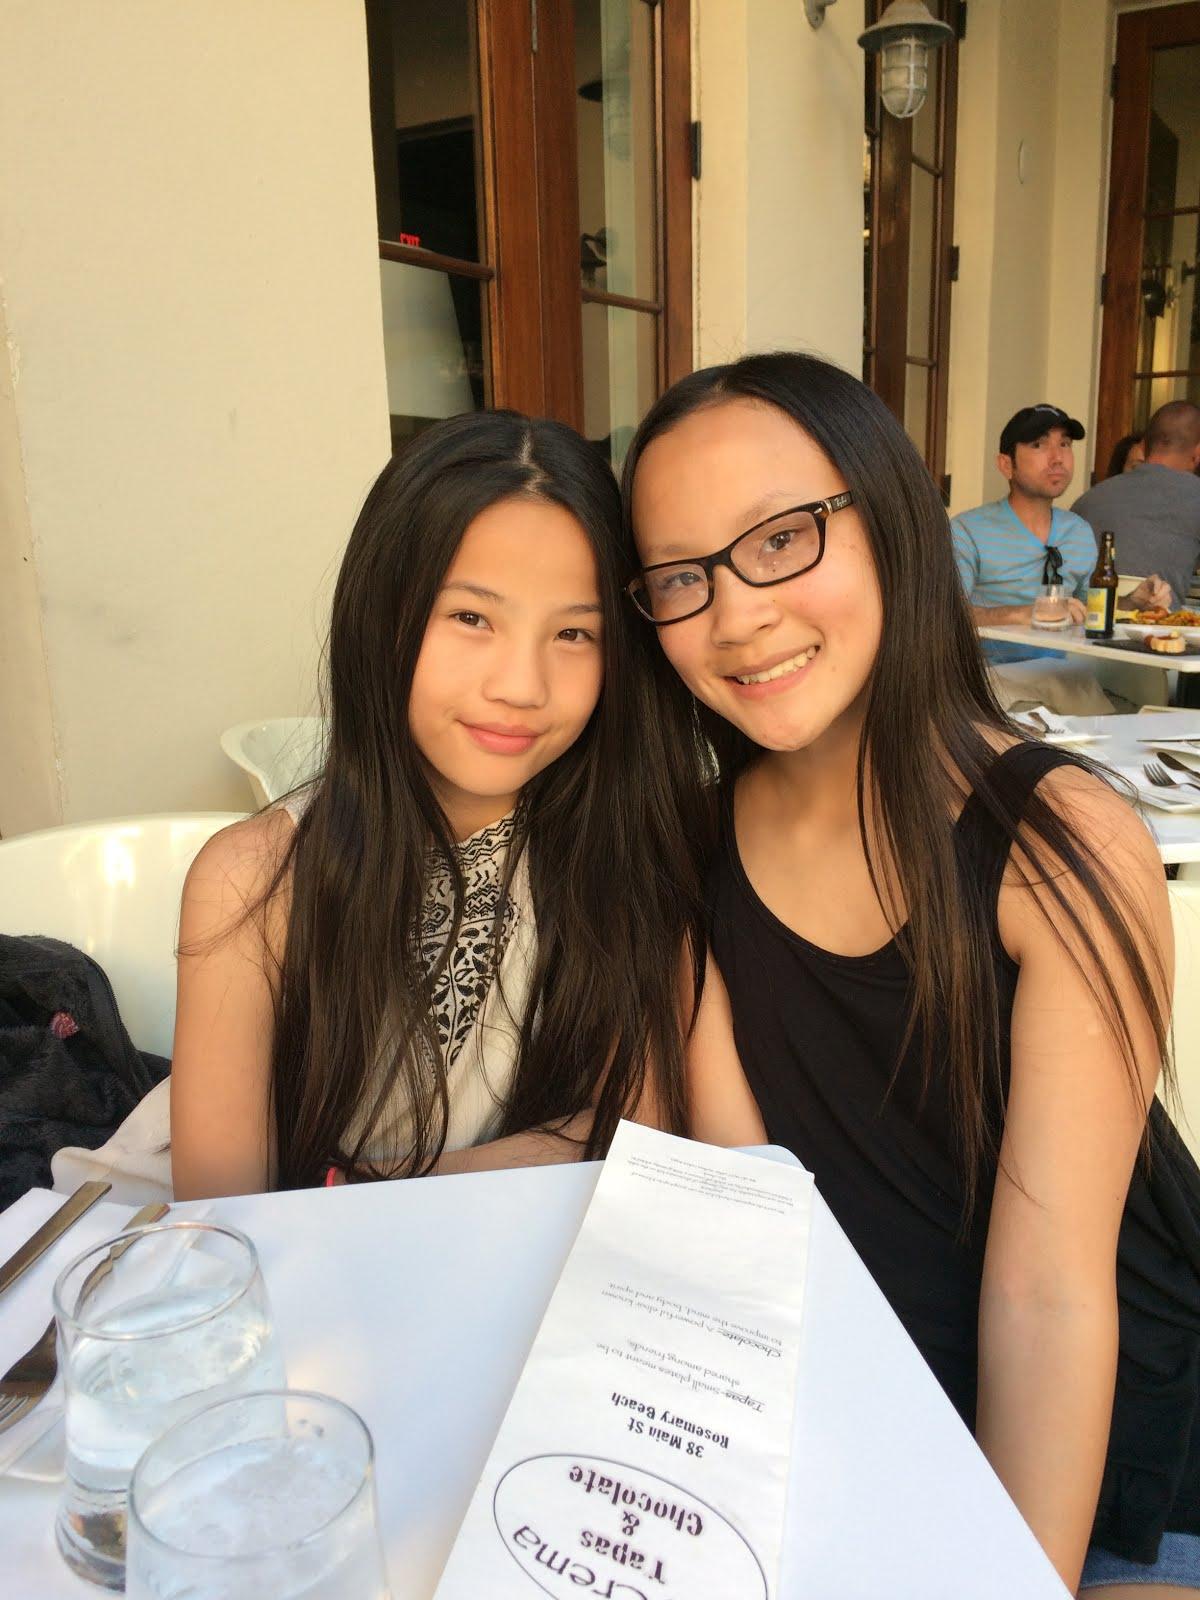 Zoe and Joelle